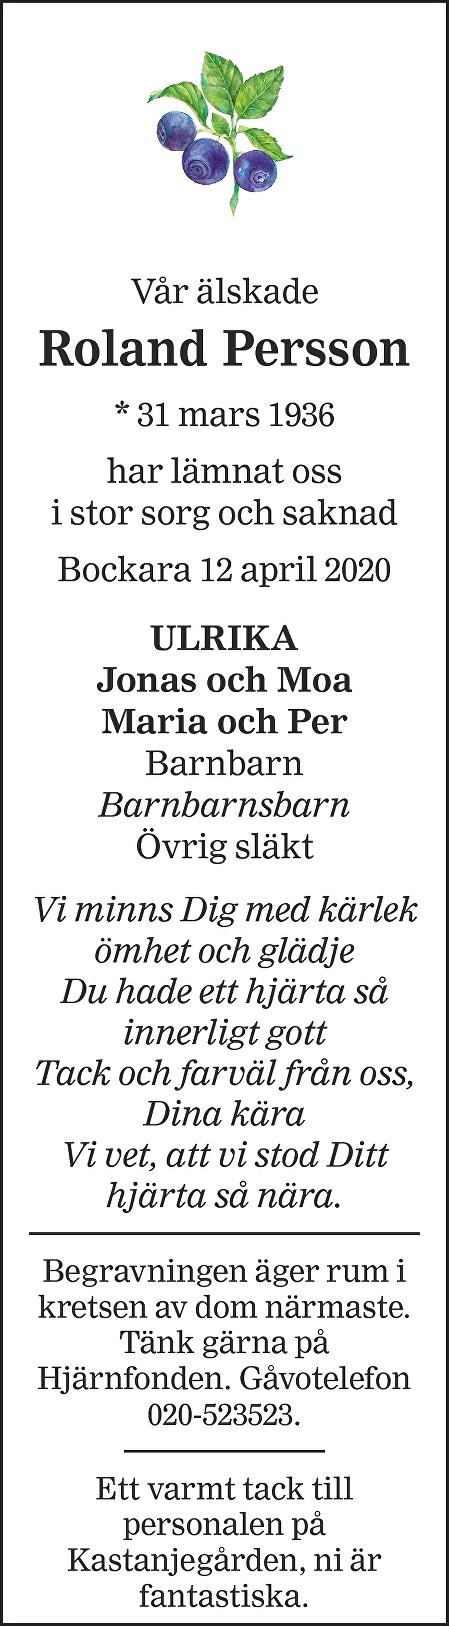 Roland Persson Death notice